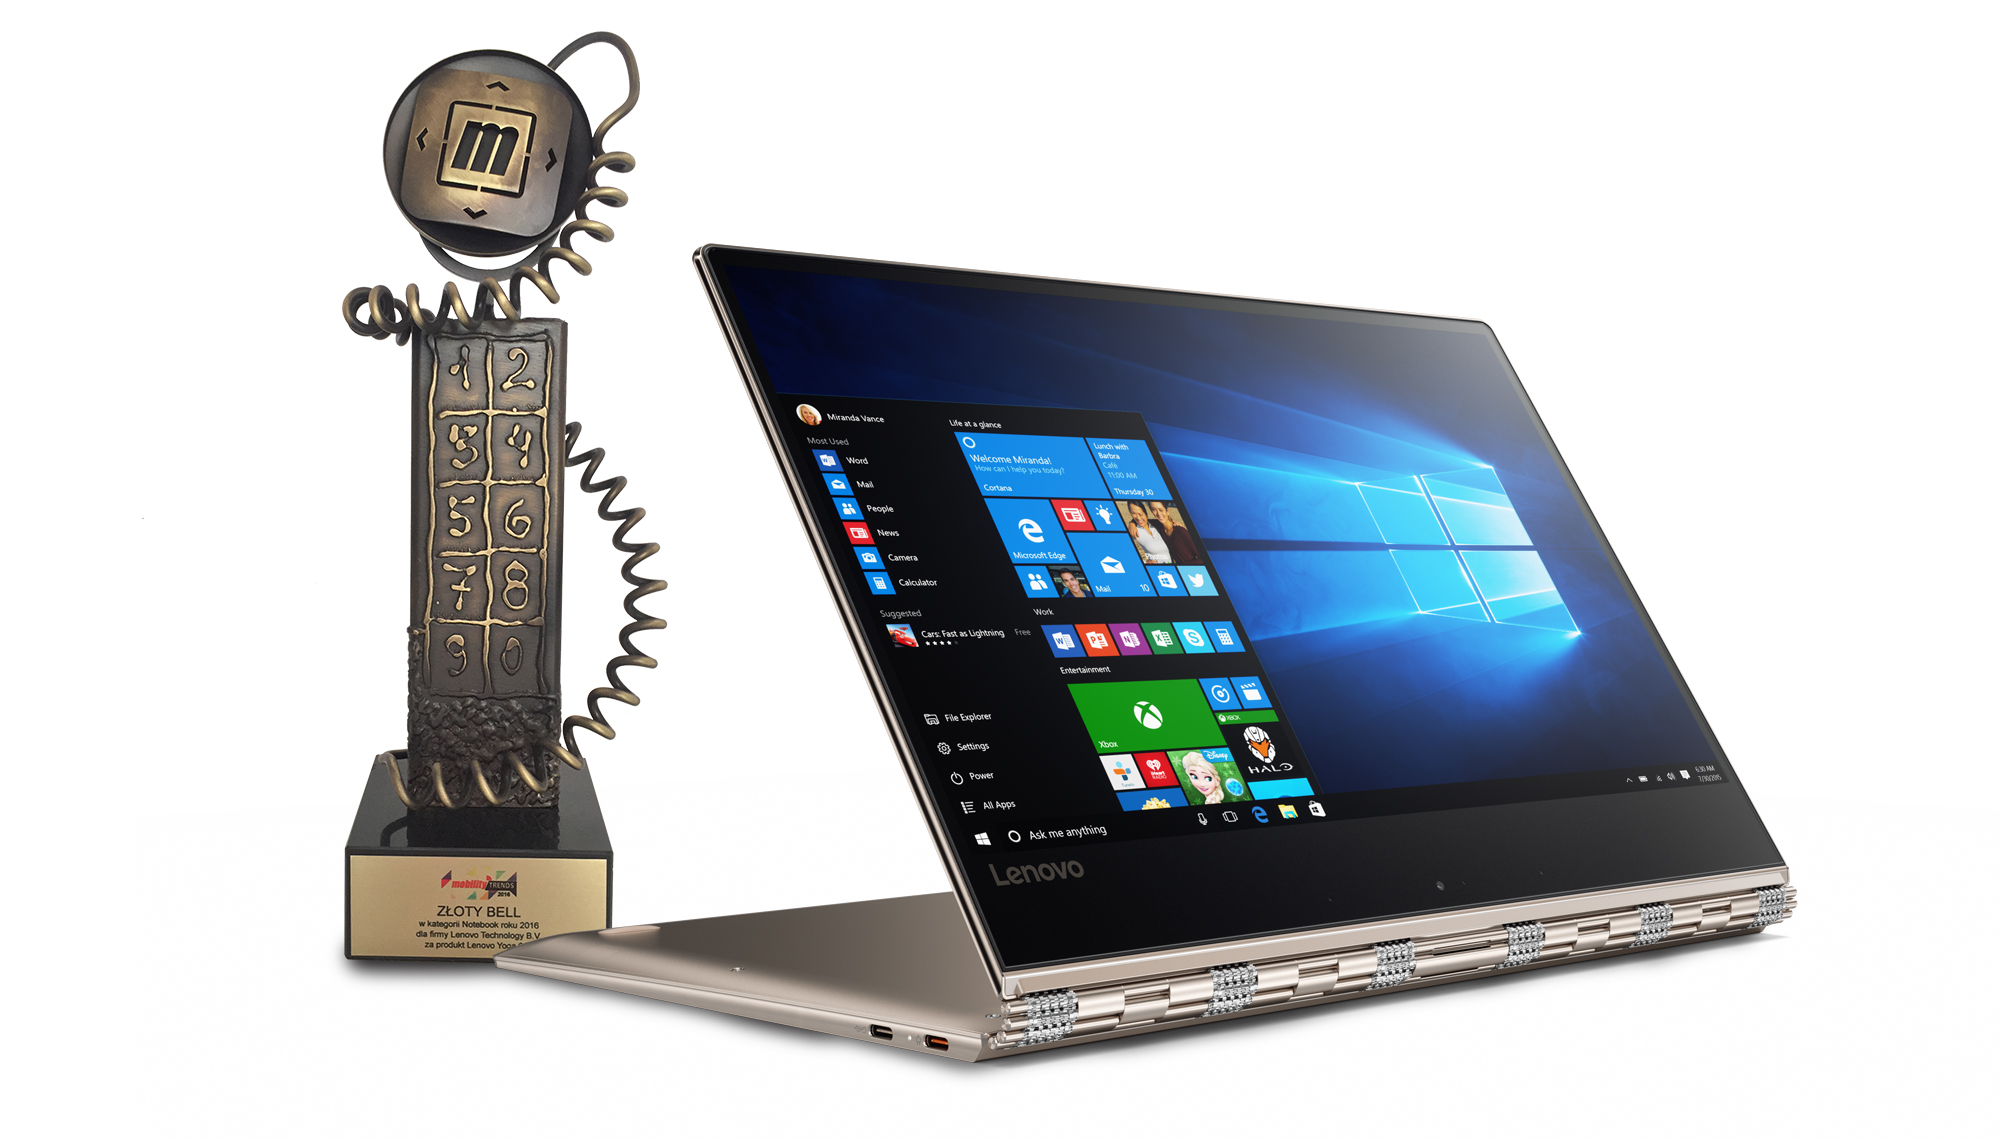 Lenovo bezkonkurencyjne podczas Gali Mobility Trends 2016 ...